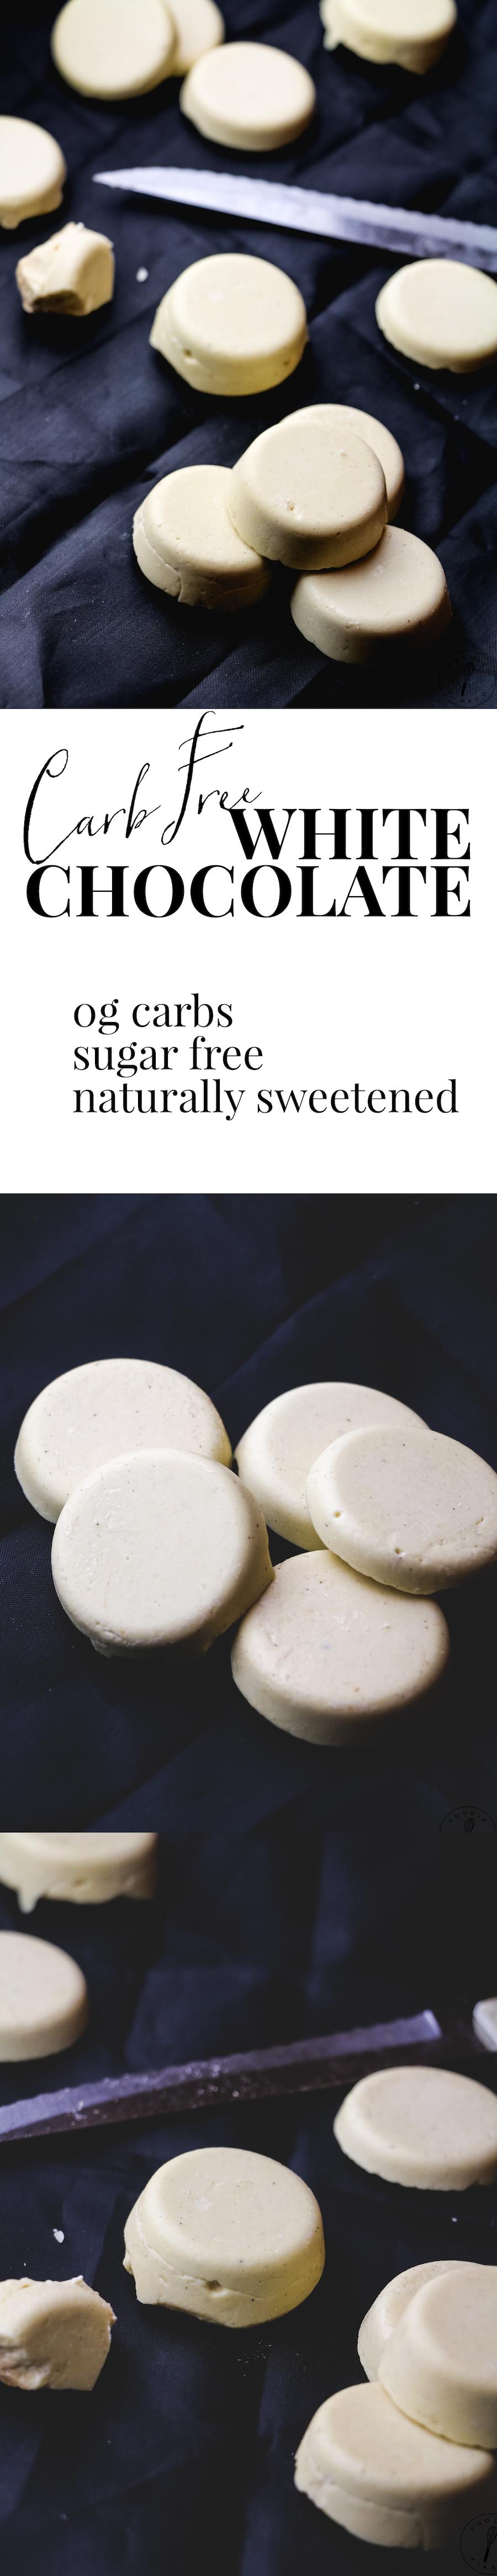 white-chocolate-pinterest